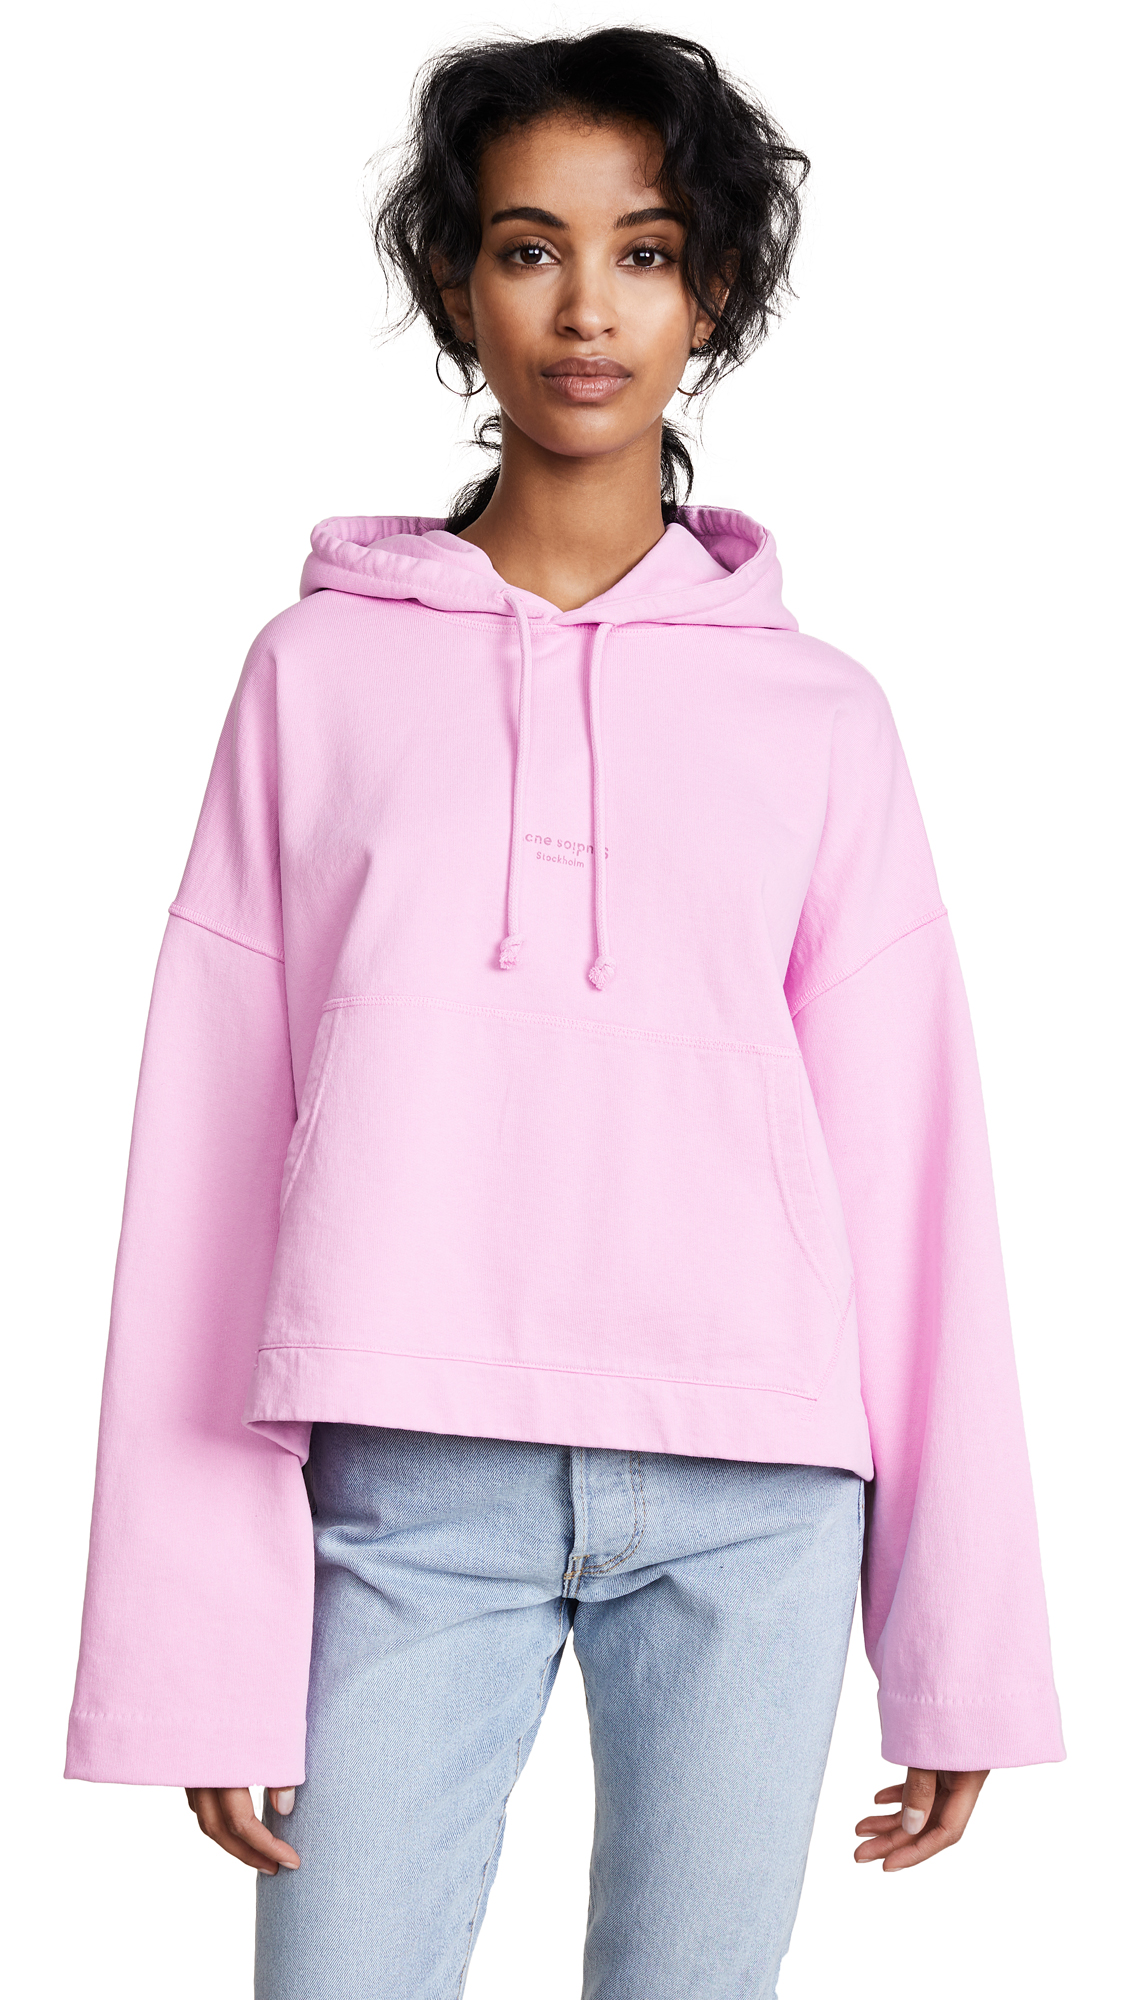 Acne Studios Joggy Sweatshirt - Candy Pink